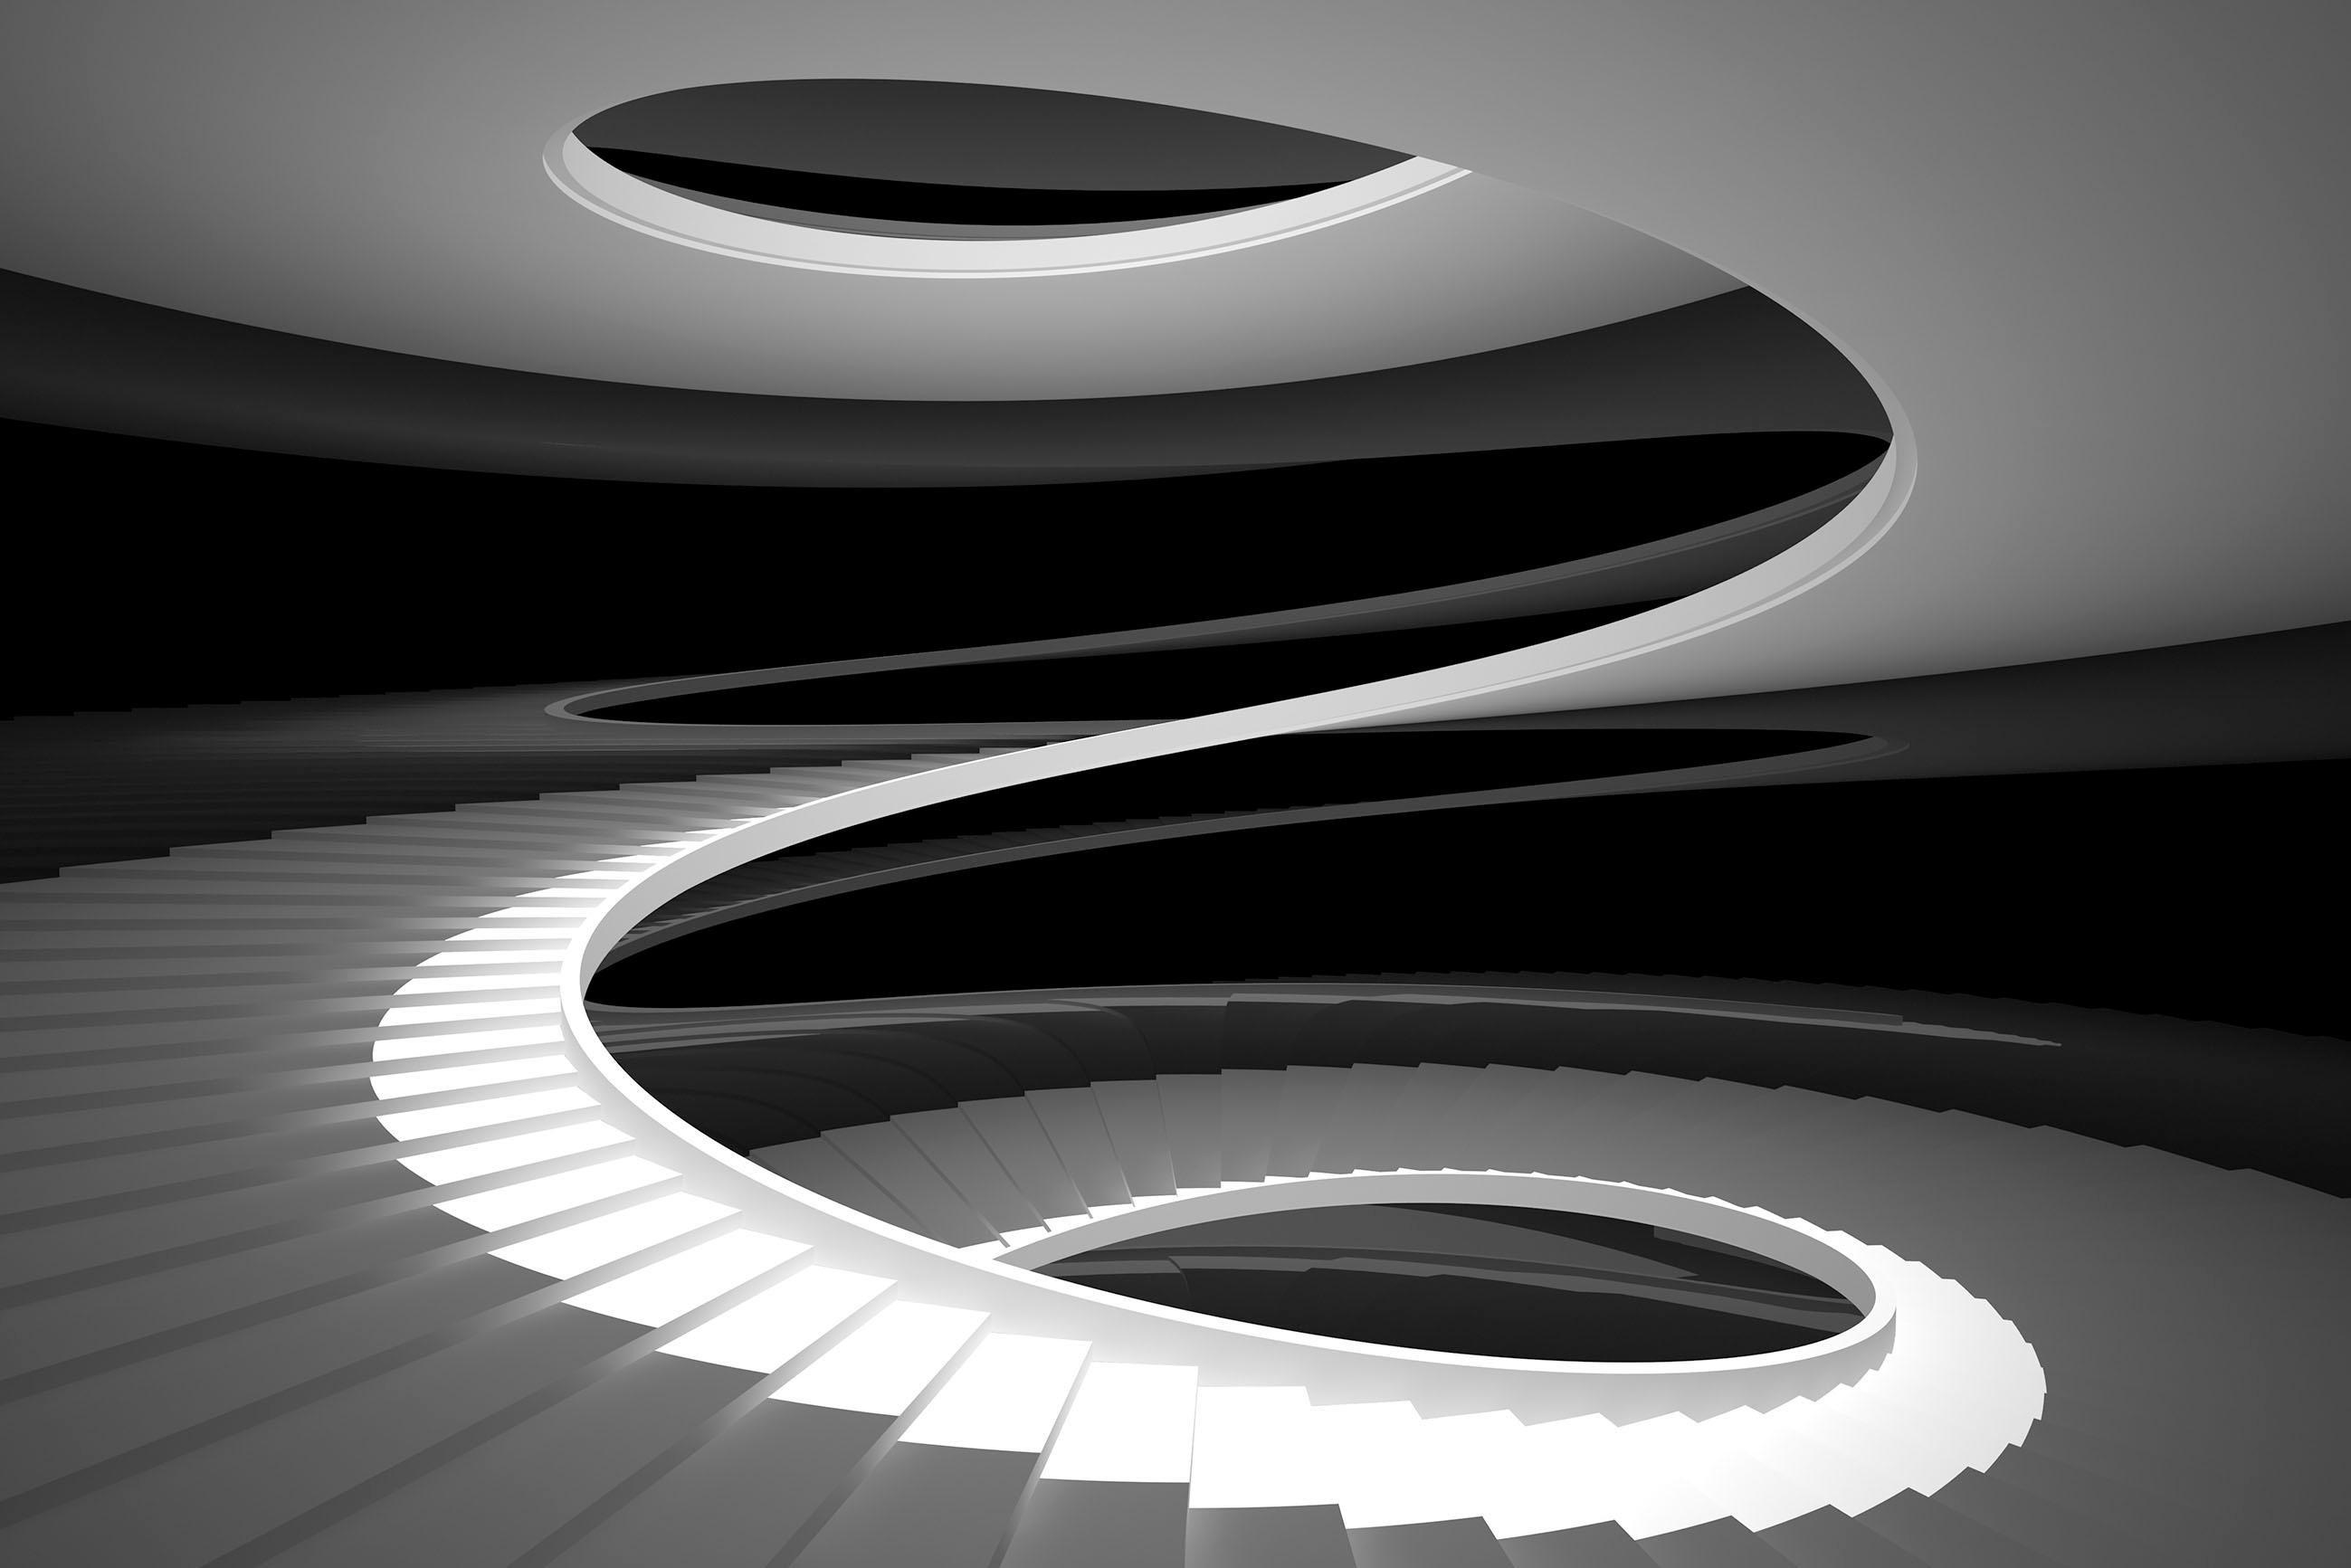 Places of Style artprint op acrylglas Wenteltrap online kopen op otto.nl